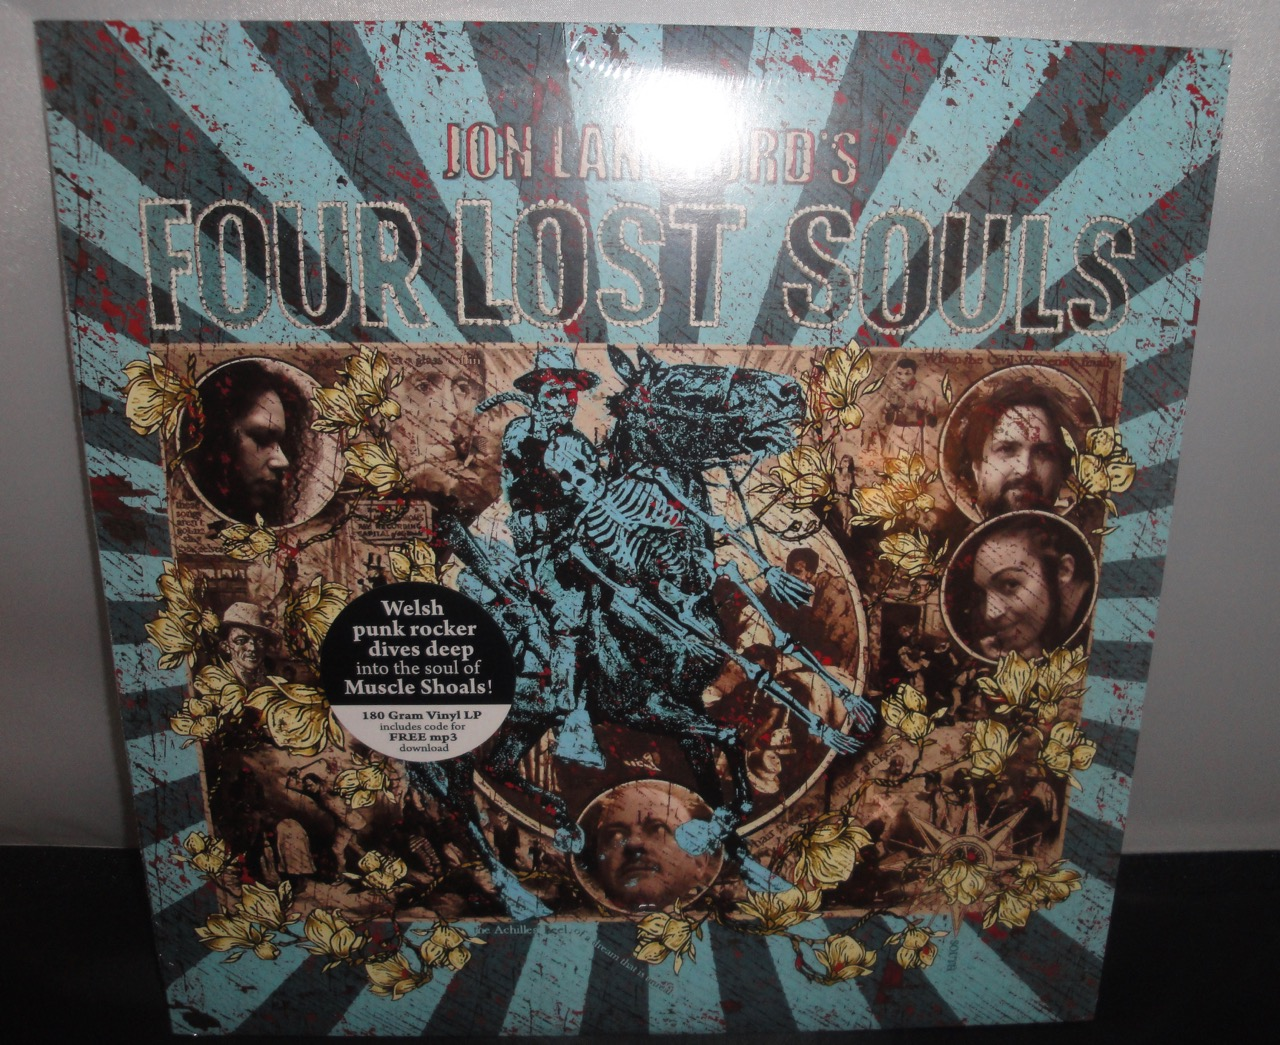 Jon Langford - Four Lost Souls